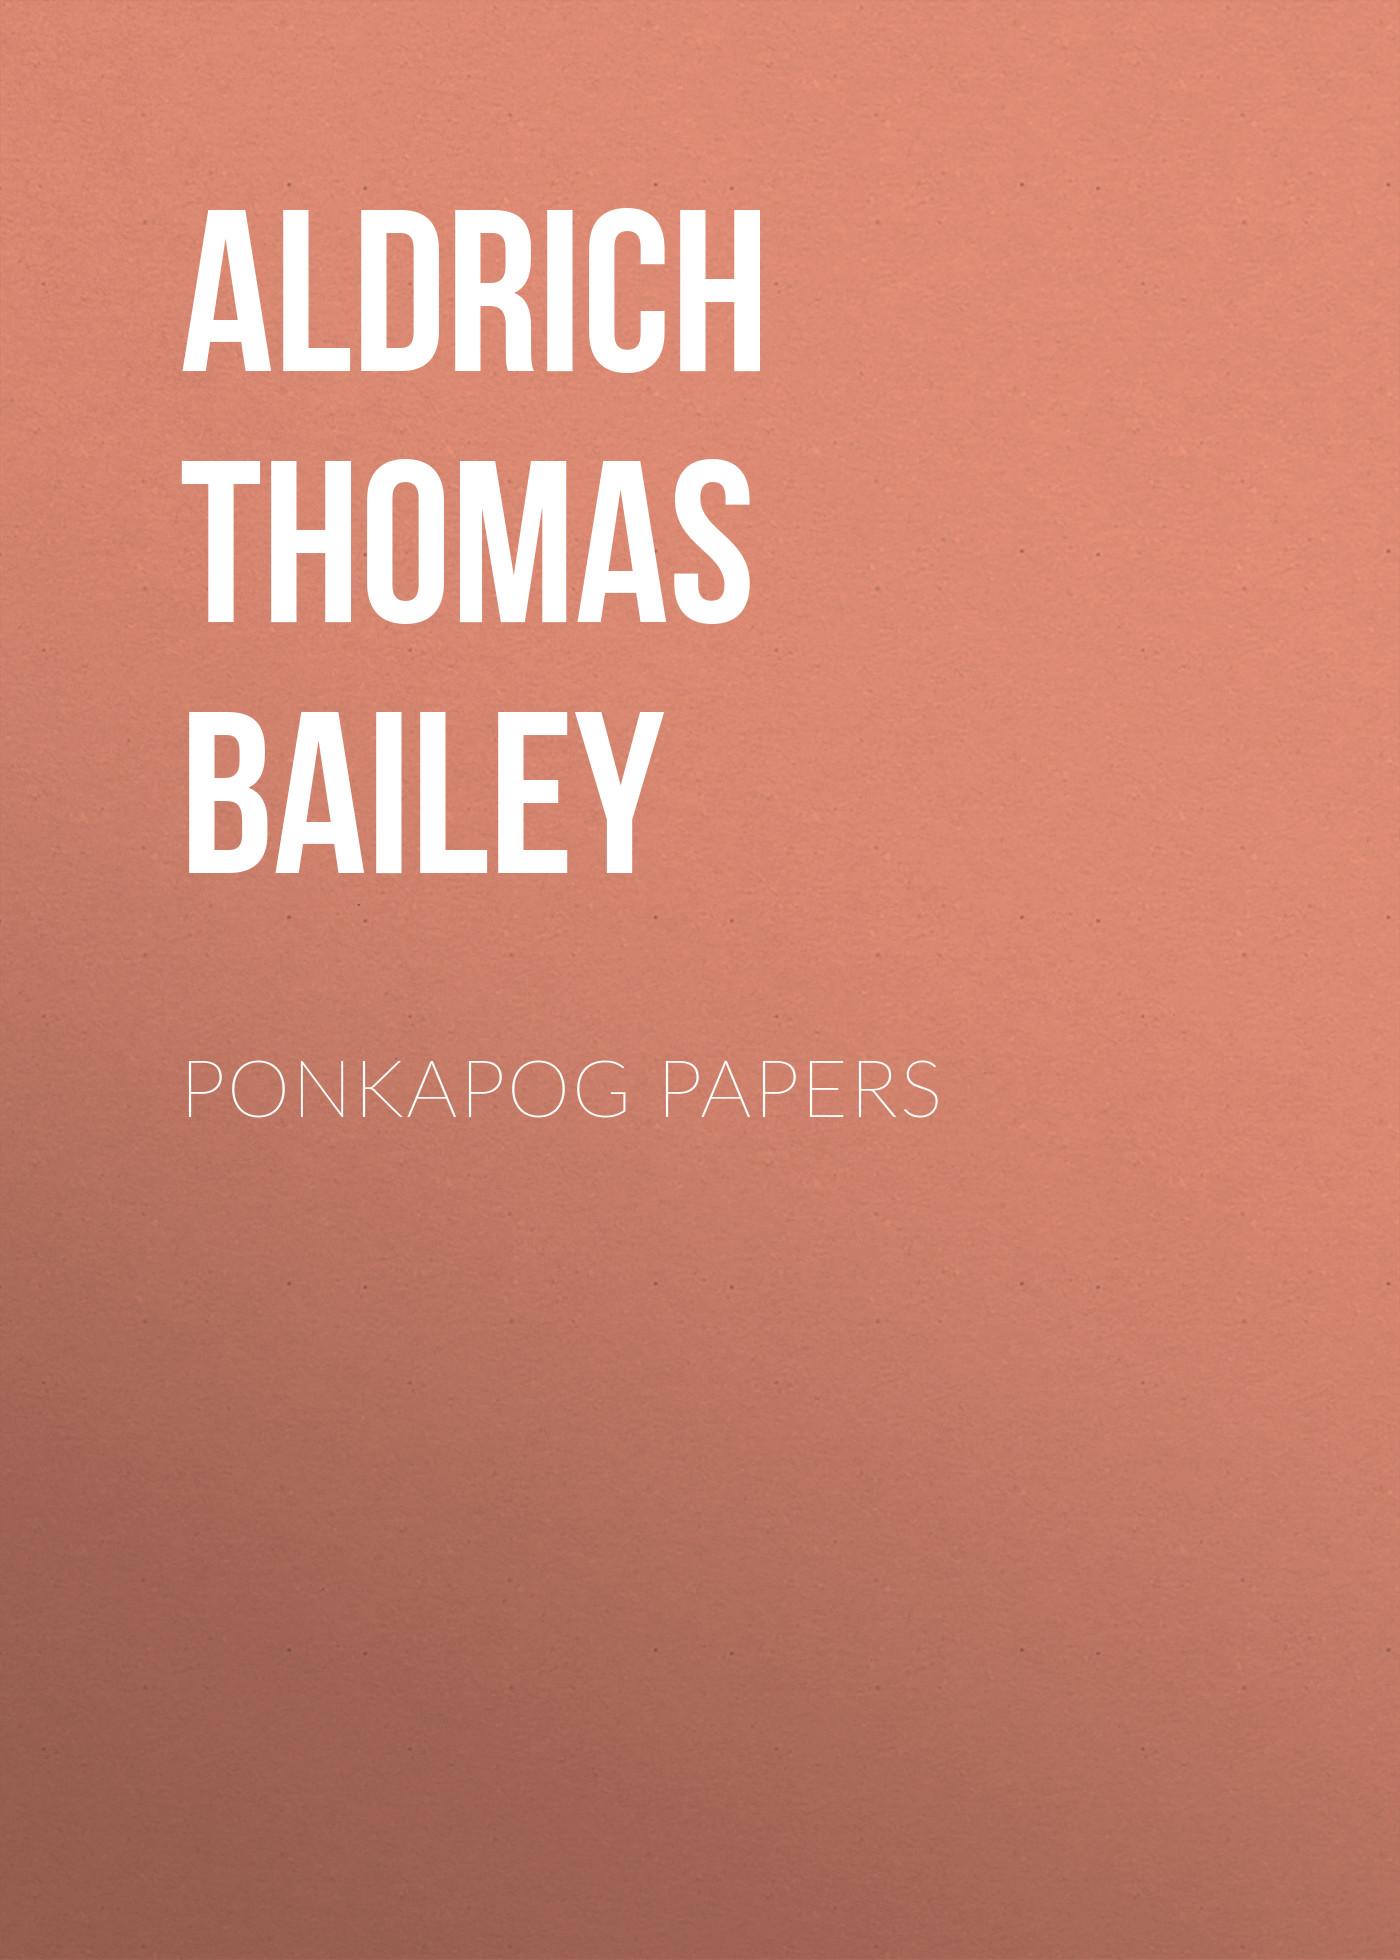 все цены на Aldrich Thomas Bailey Ponkapog Papers онлайн